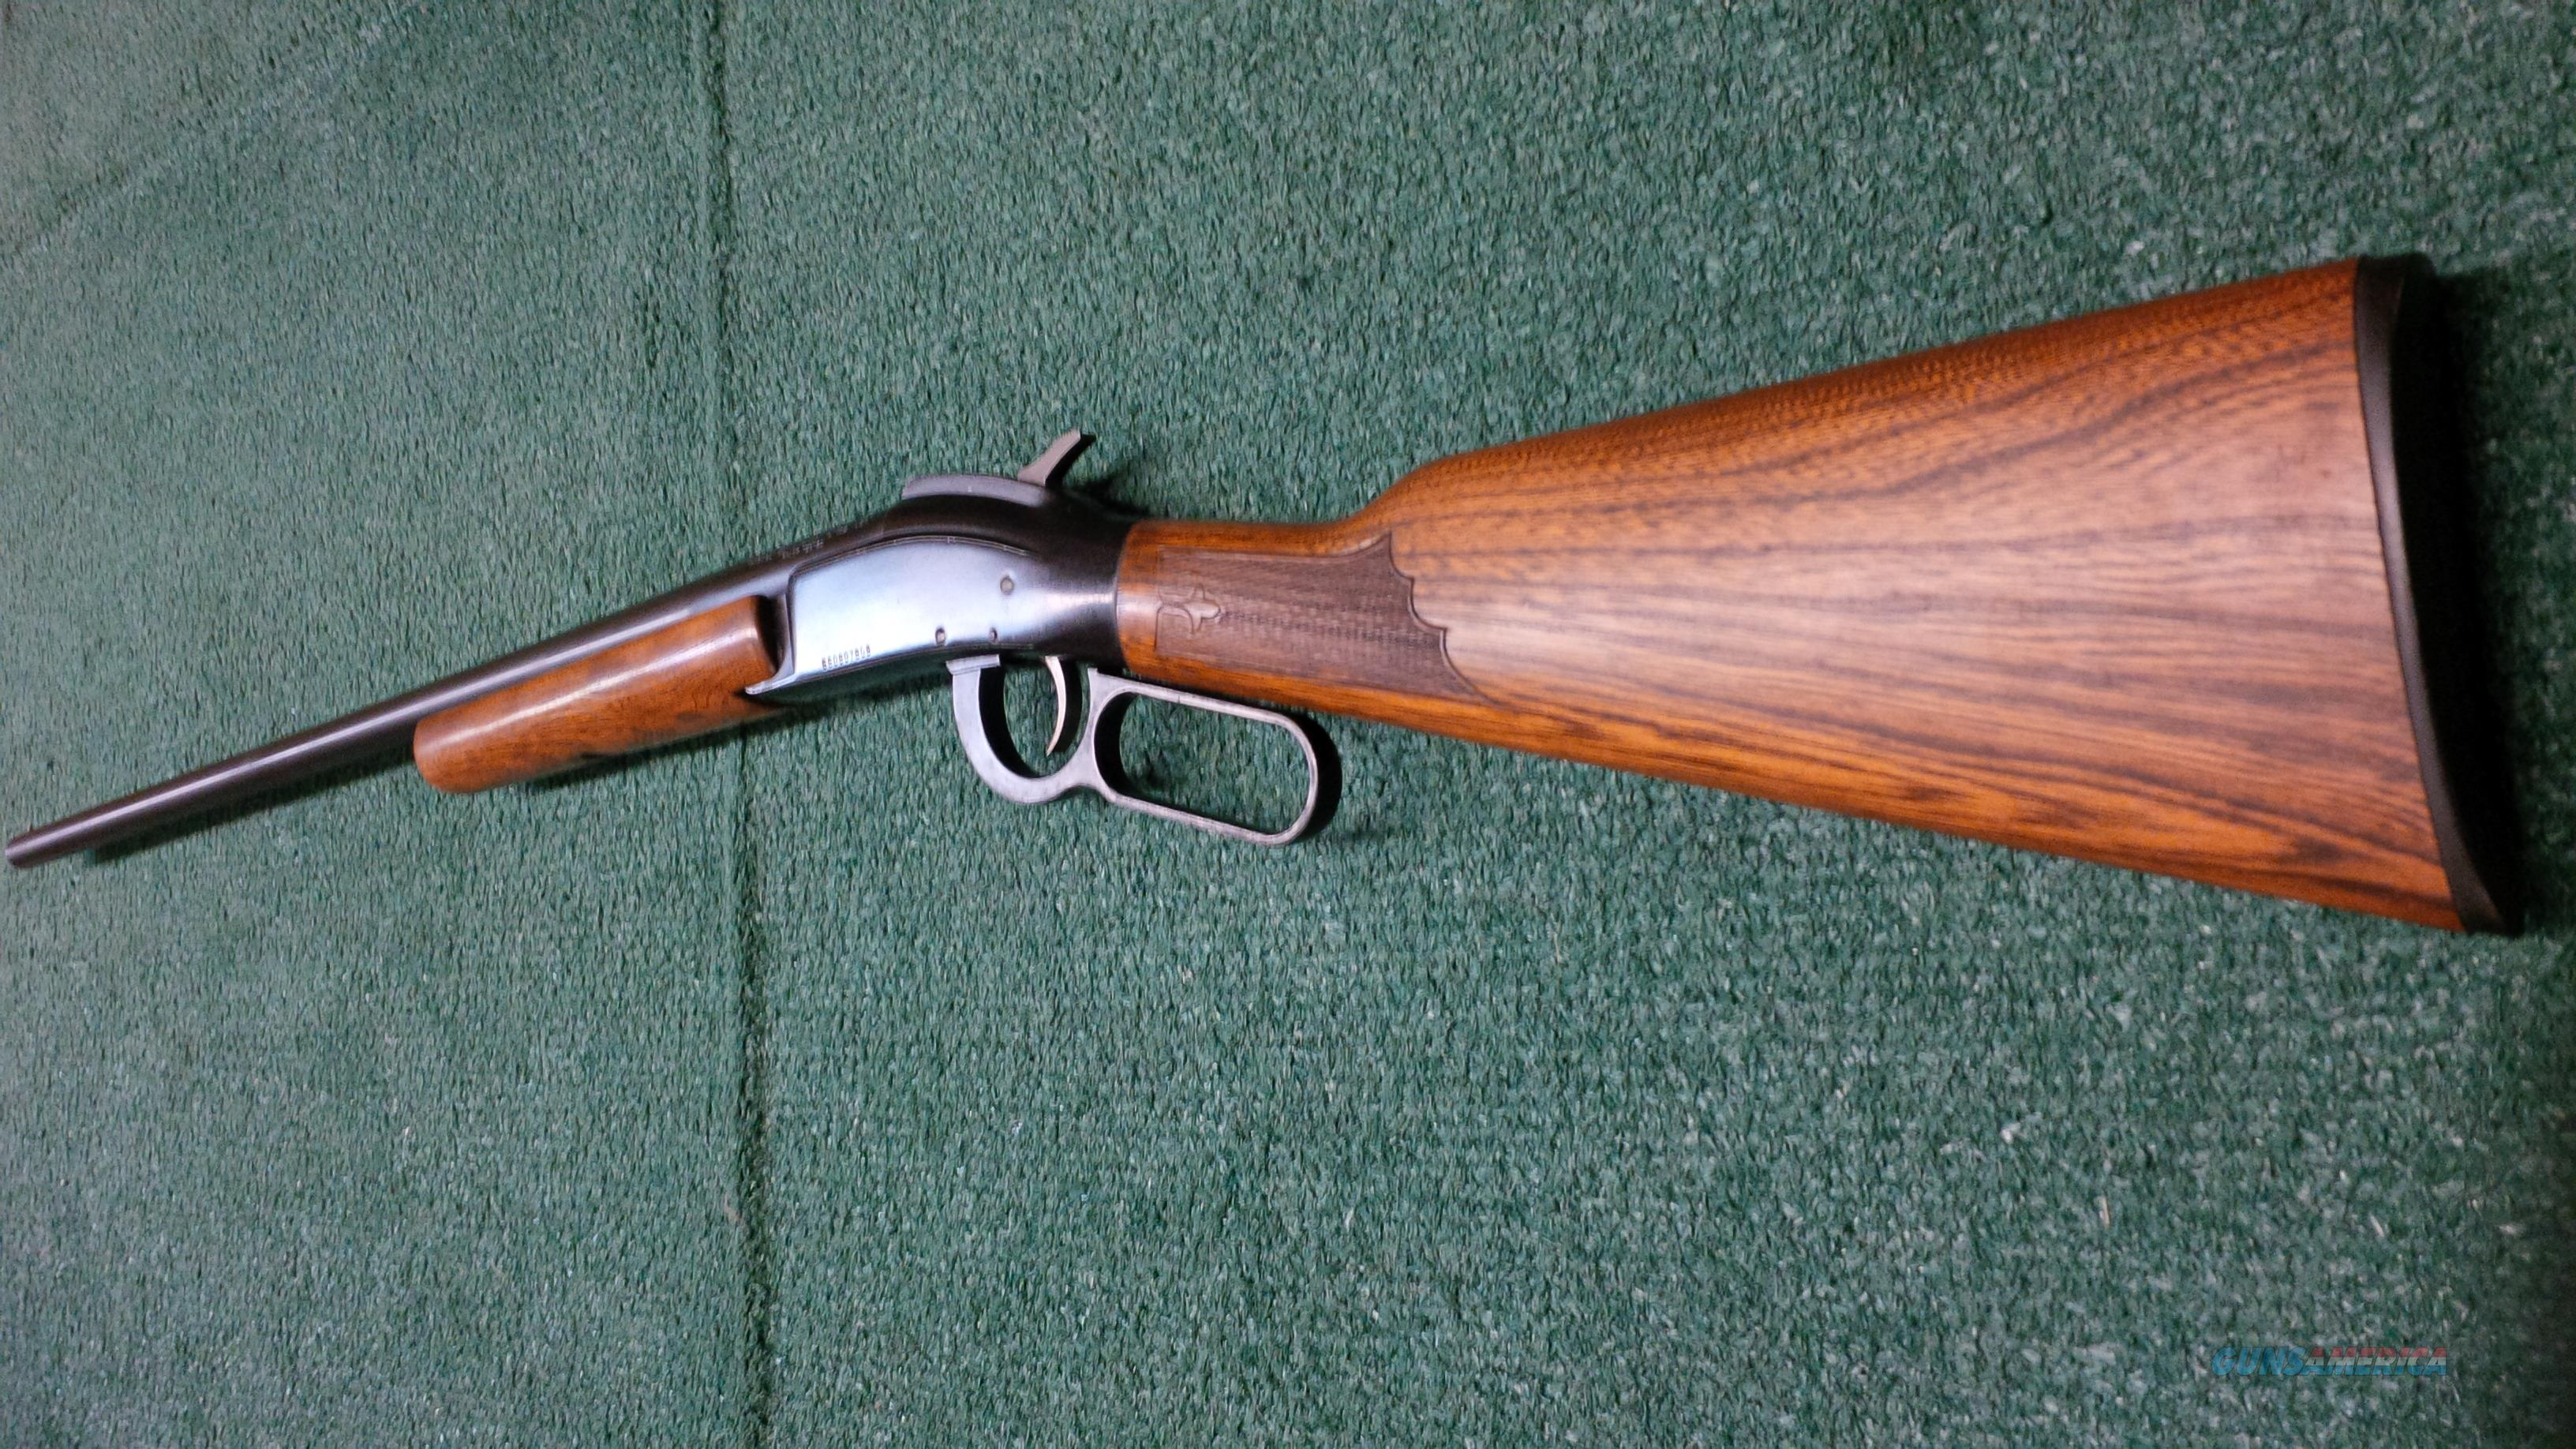 Ithaca 66 20 Gauge Supersingle  Guns > Shotguns > Ithaca Shotguns > Single Bbl > Sporting/Hunting